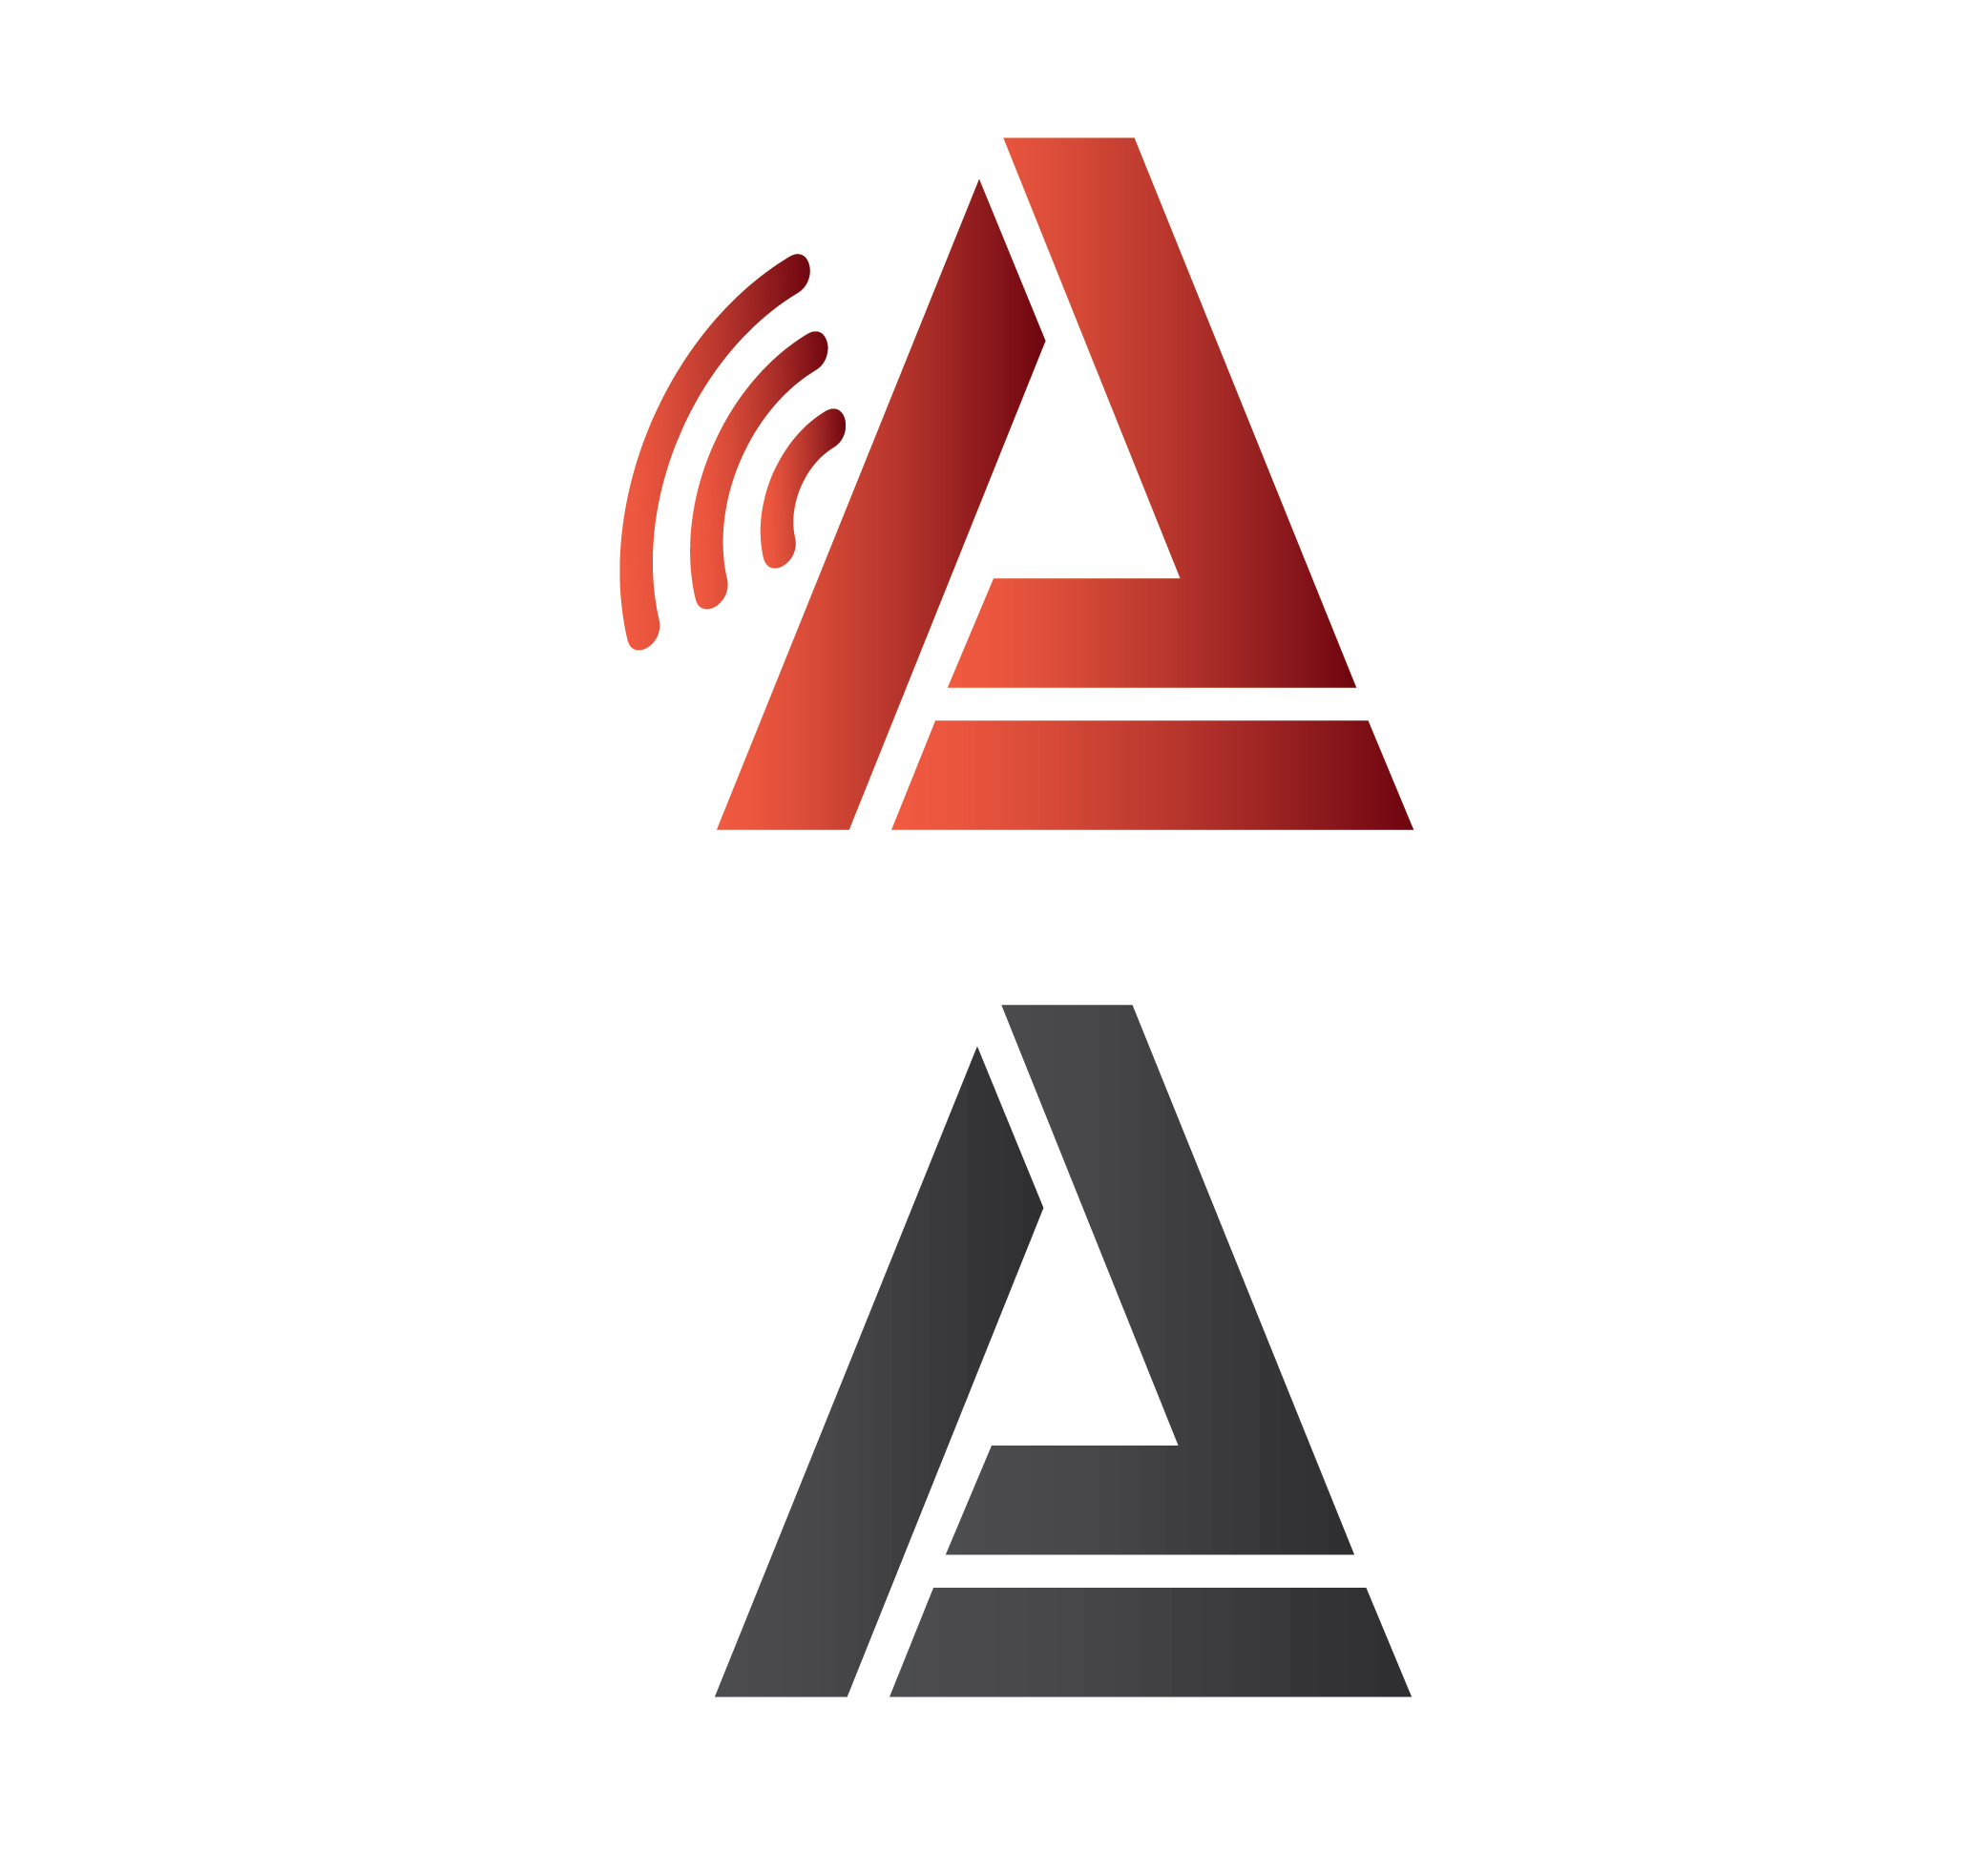 Дизайнер для разработки логотипа компании фото f_9255bf6926bad78c.jpg